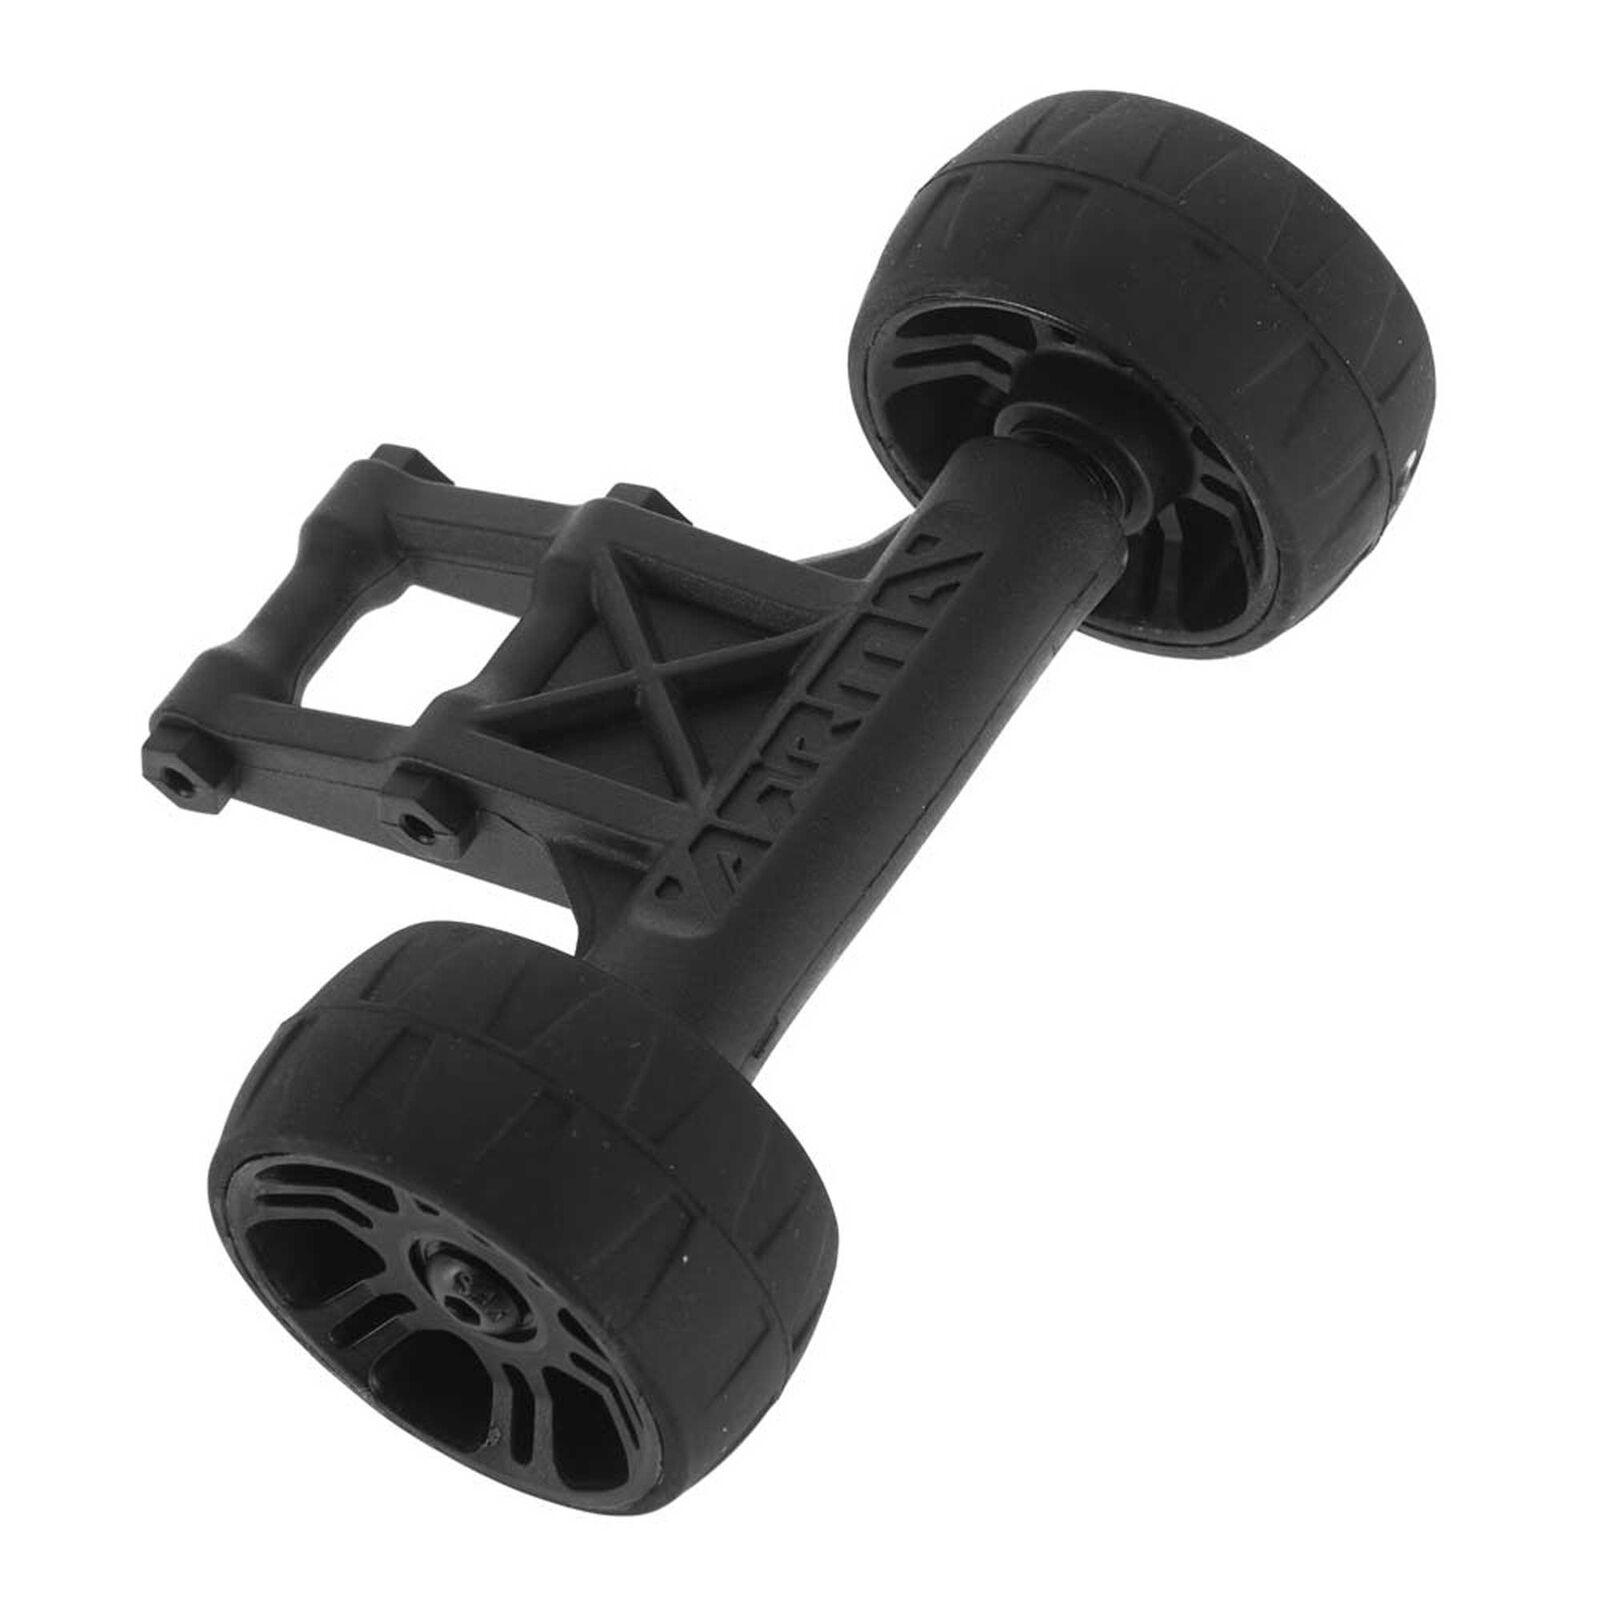 Wheelie Bar Set: Outcast